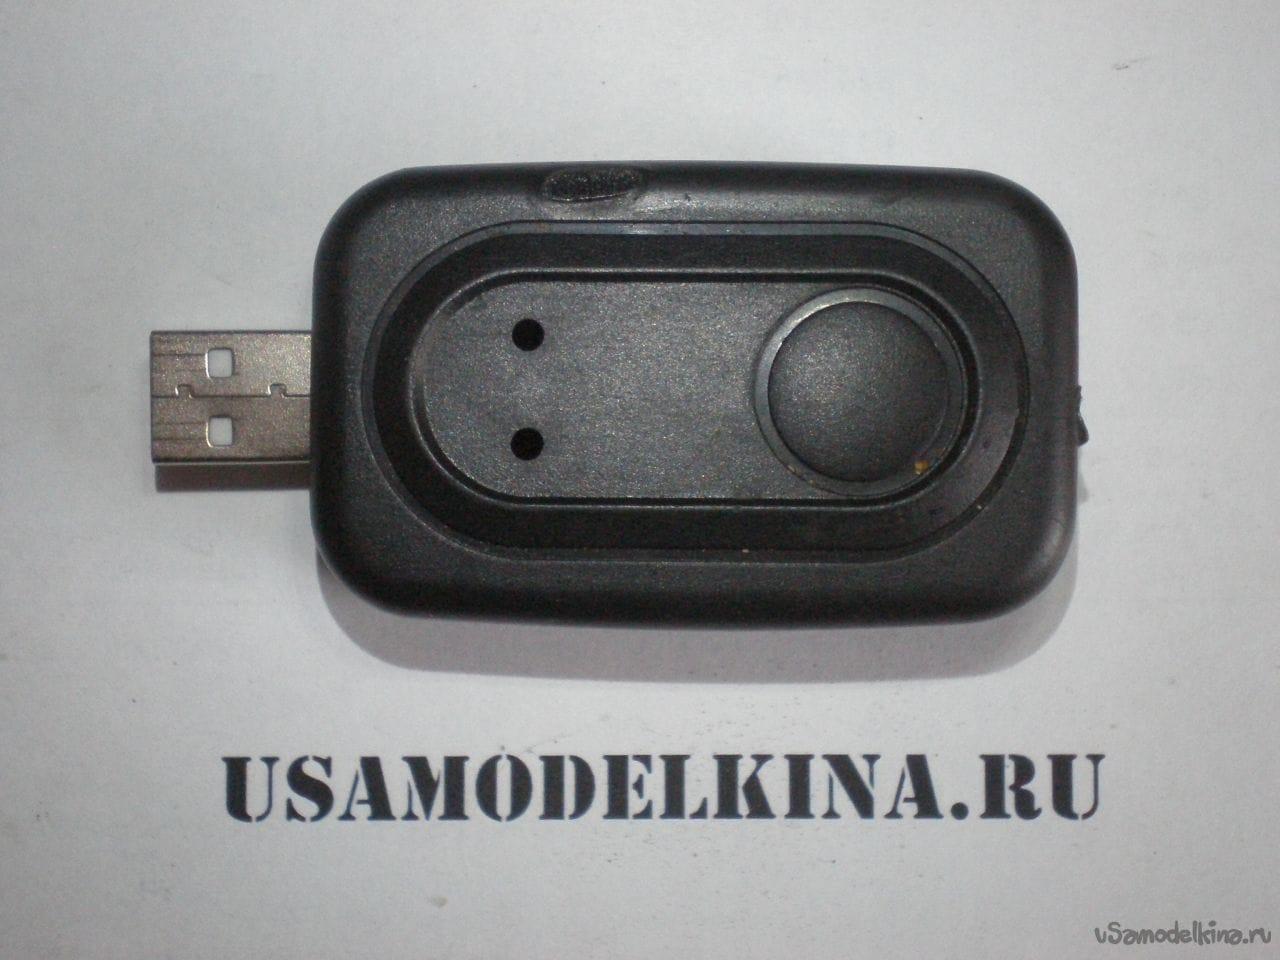 Wifi приемник для пк своими руками фото 355